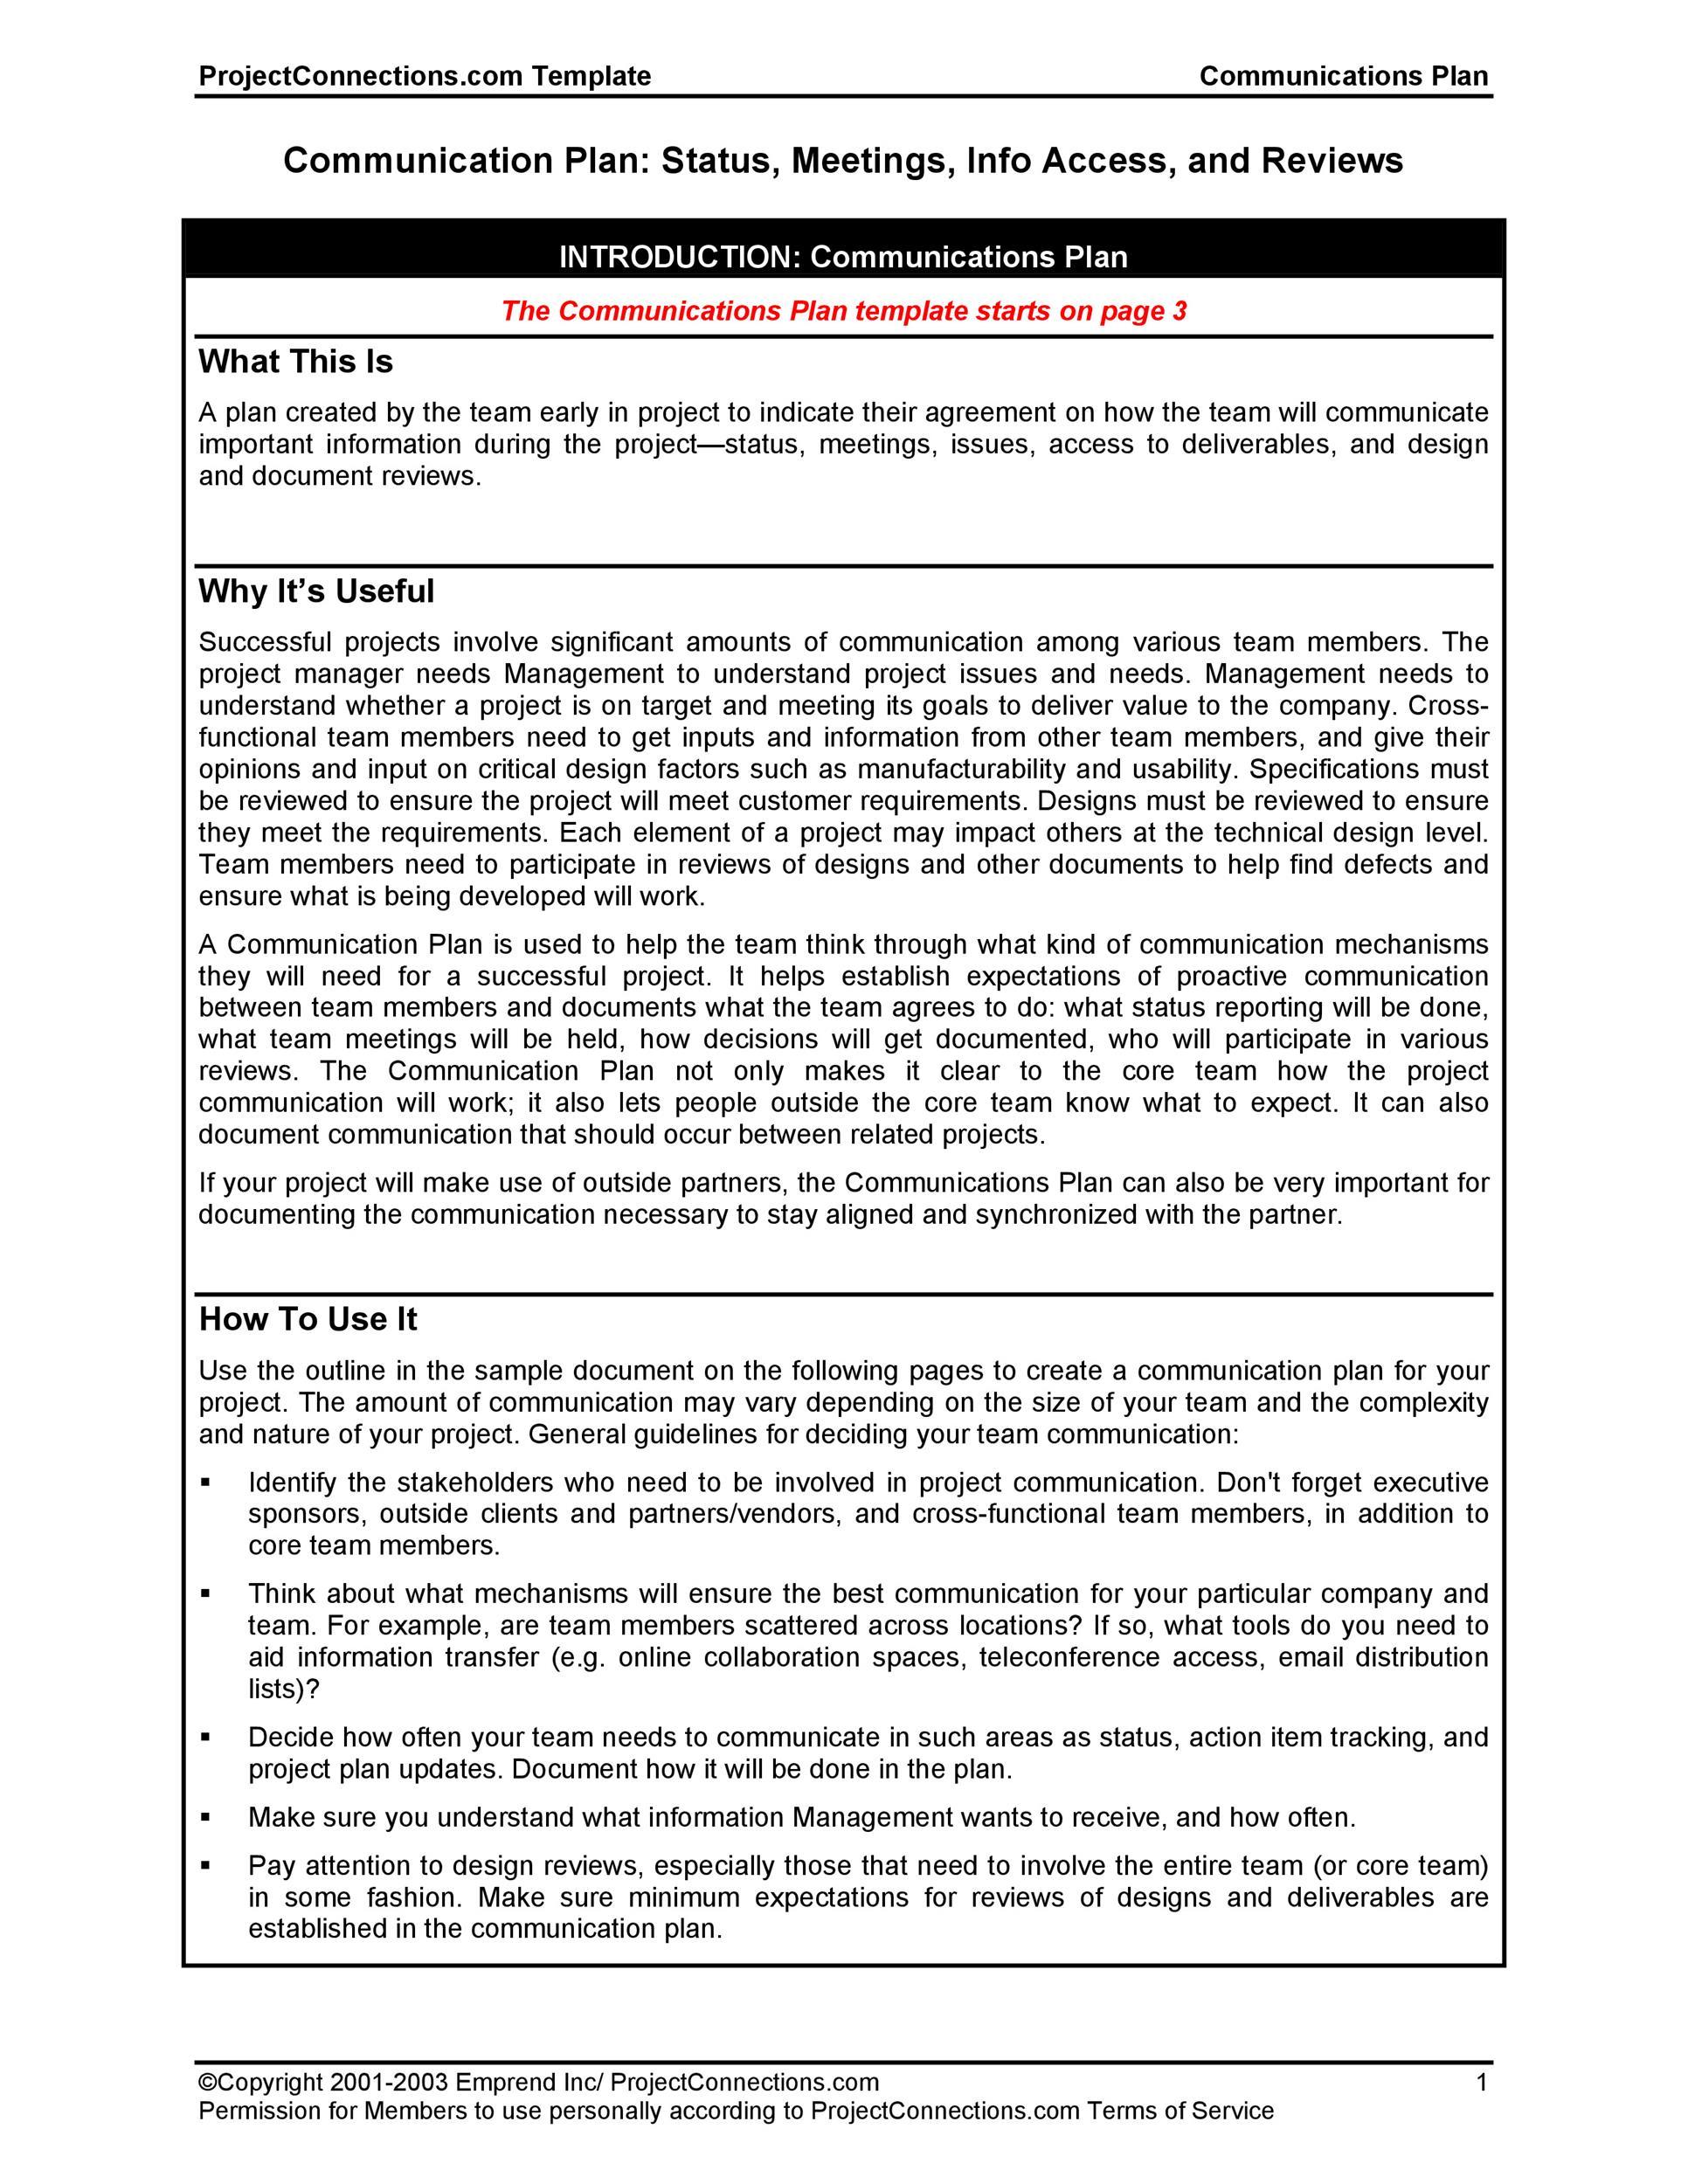 Free Communication Plan Template 14